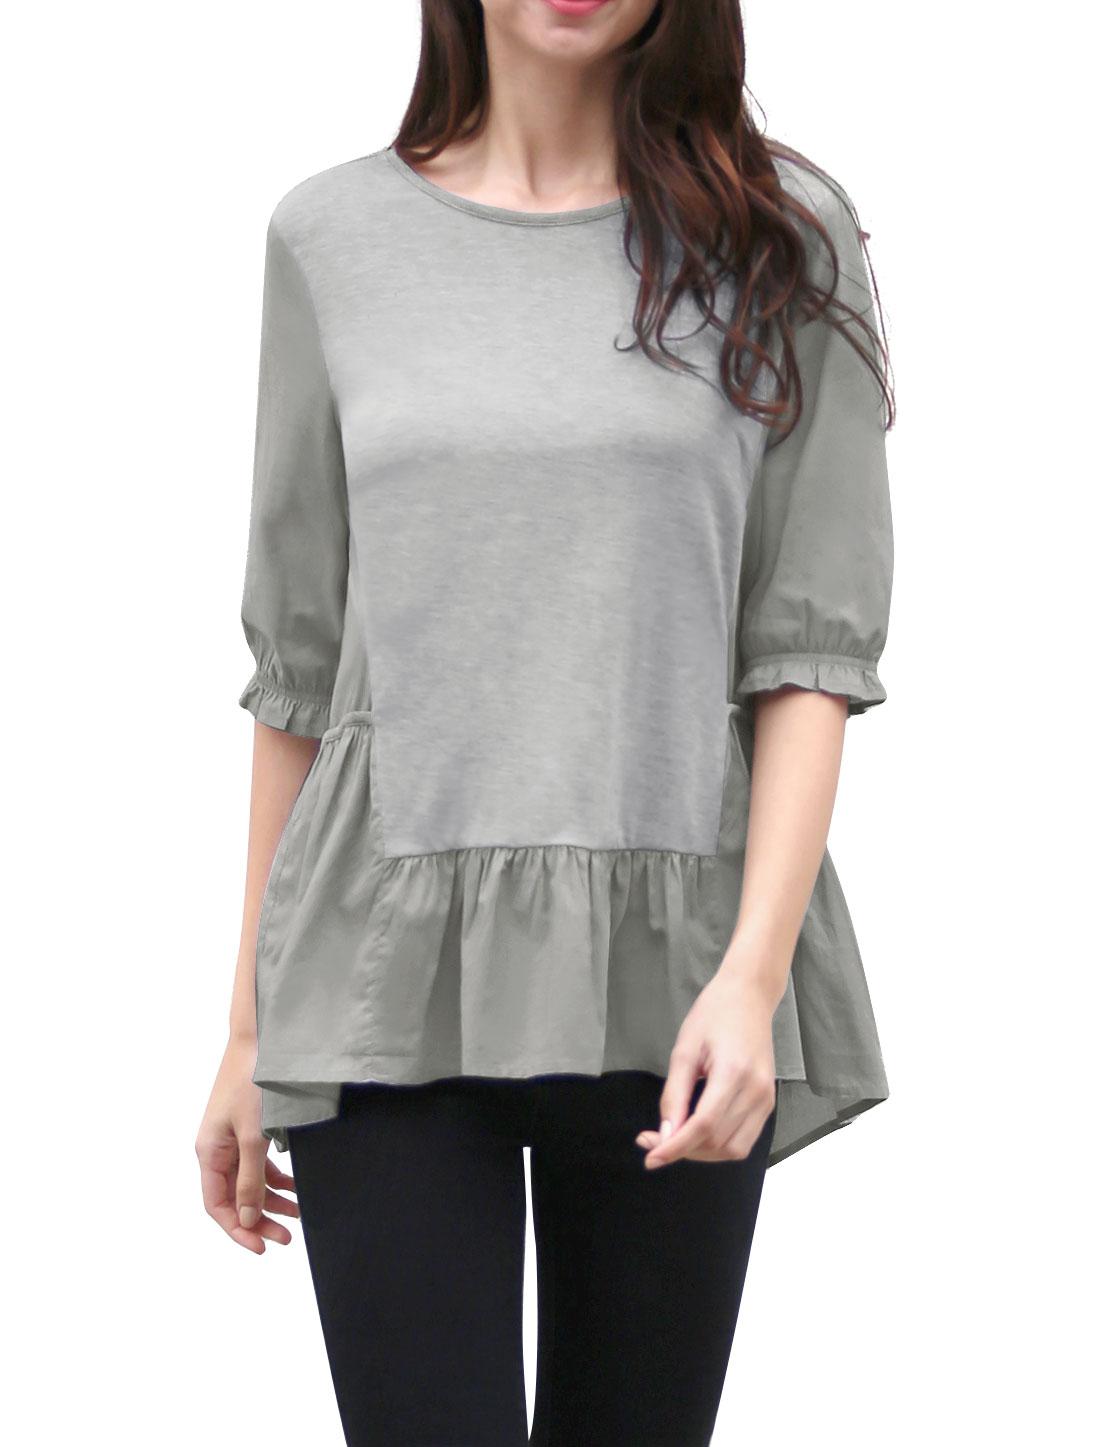 Women Ruffled High-Low Hem 1/2 Sleeves Paneled Tunic Top Gray L